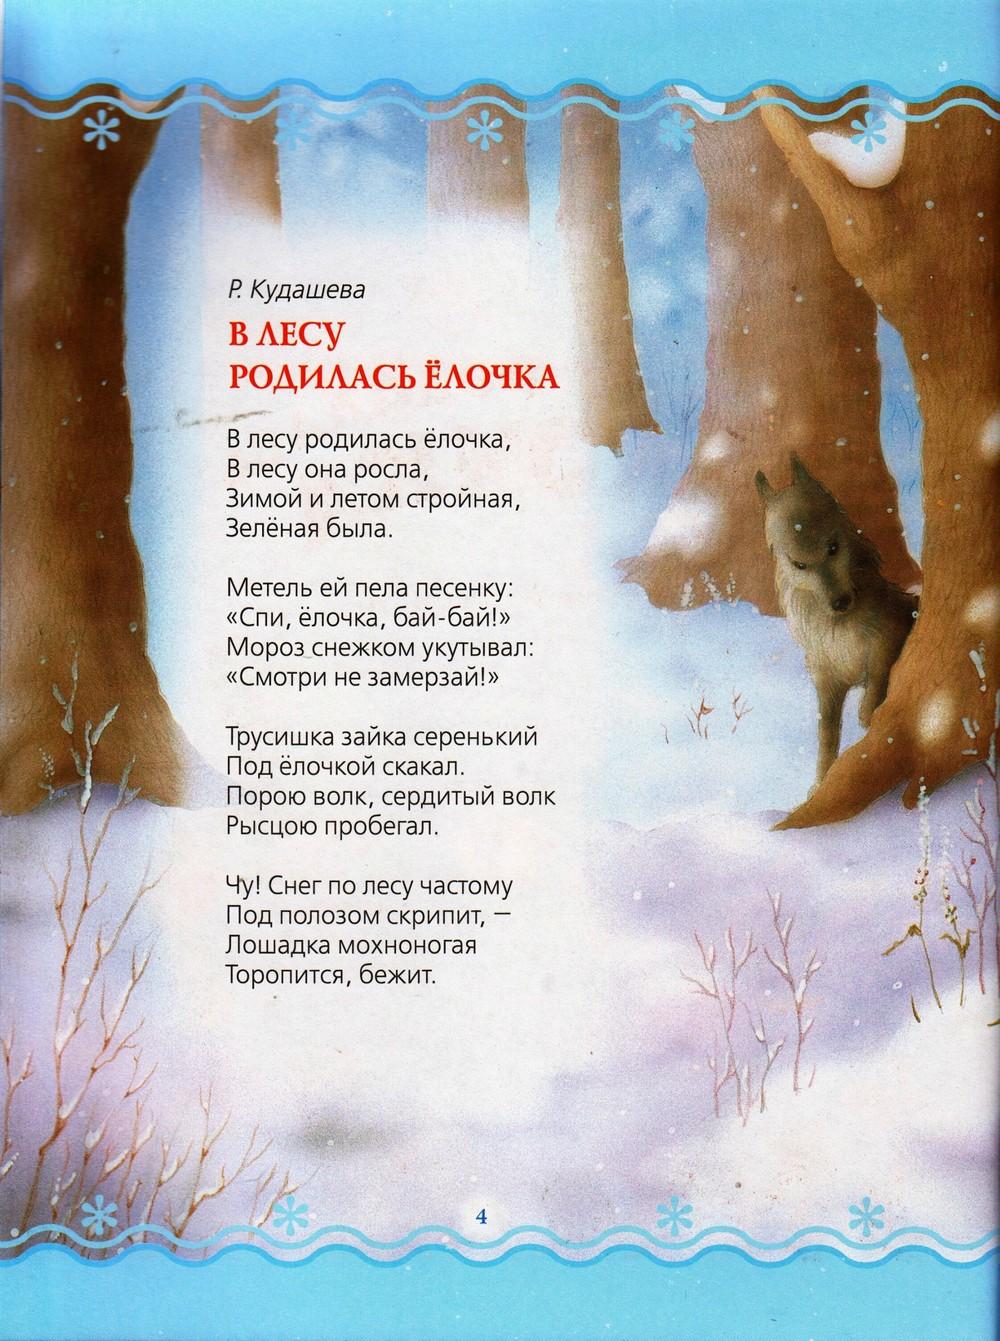 http://i2.imageban.ru/out/2013/12/19/db8d226520198d38c584cb96e40fa9cf.jpg